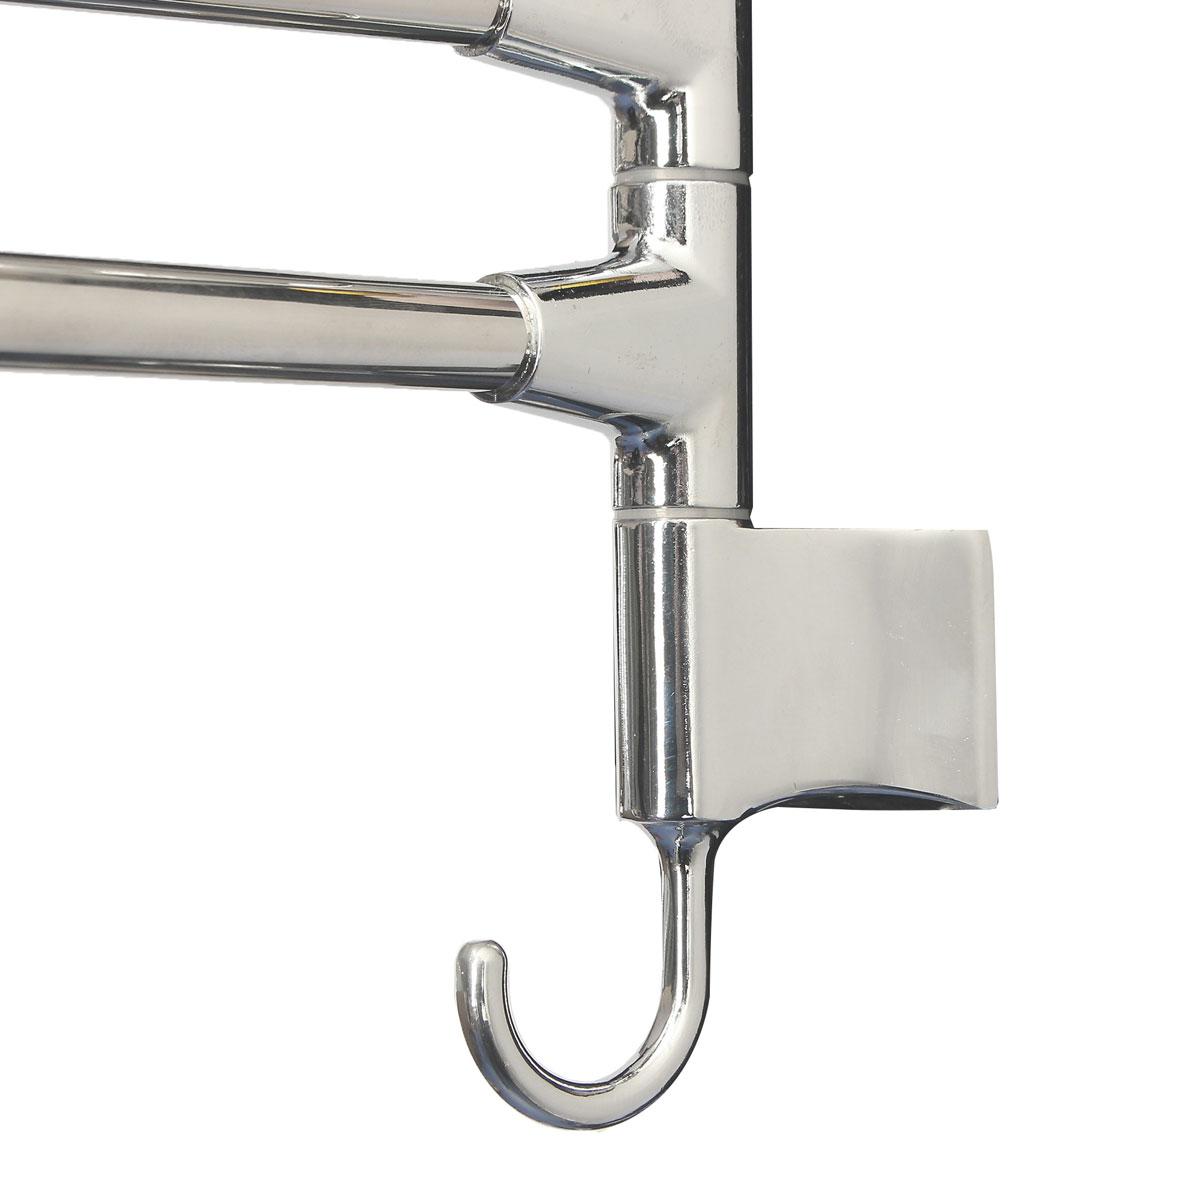 Bathroom Kitchen Wall Mounted Rotating Towel Rack Storage Hold